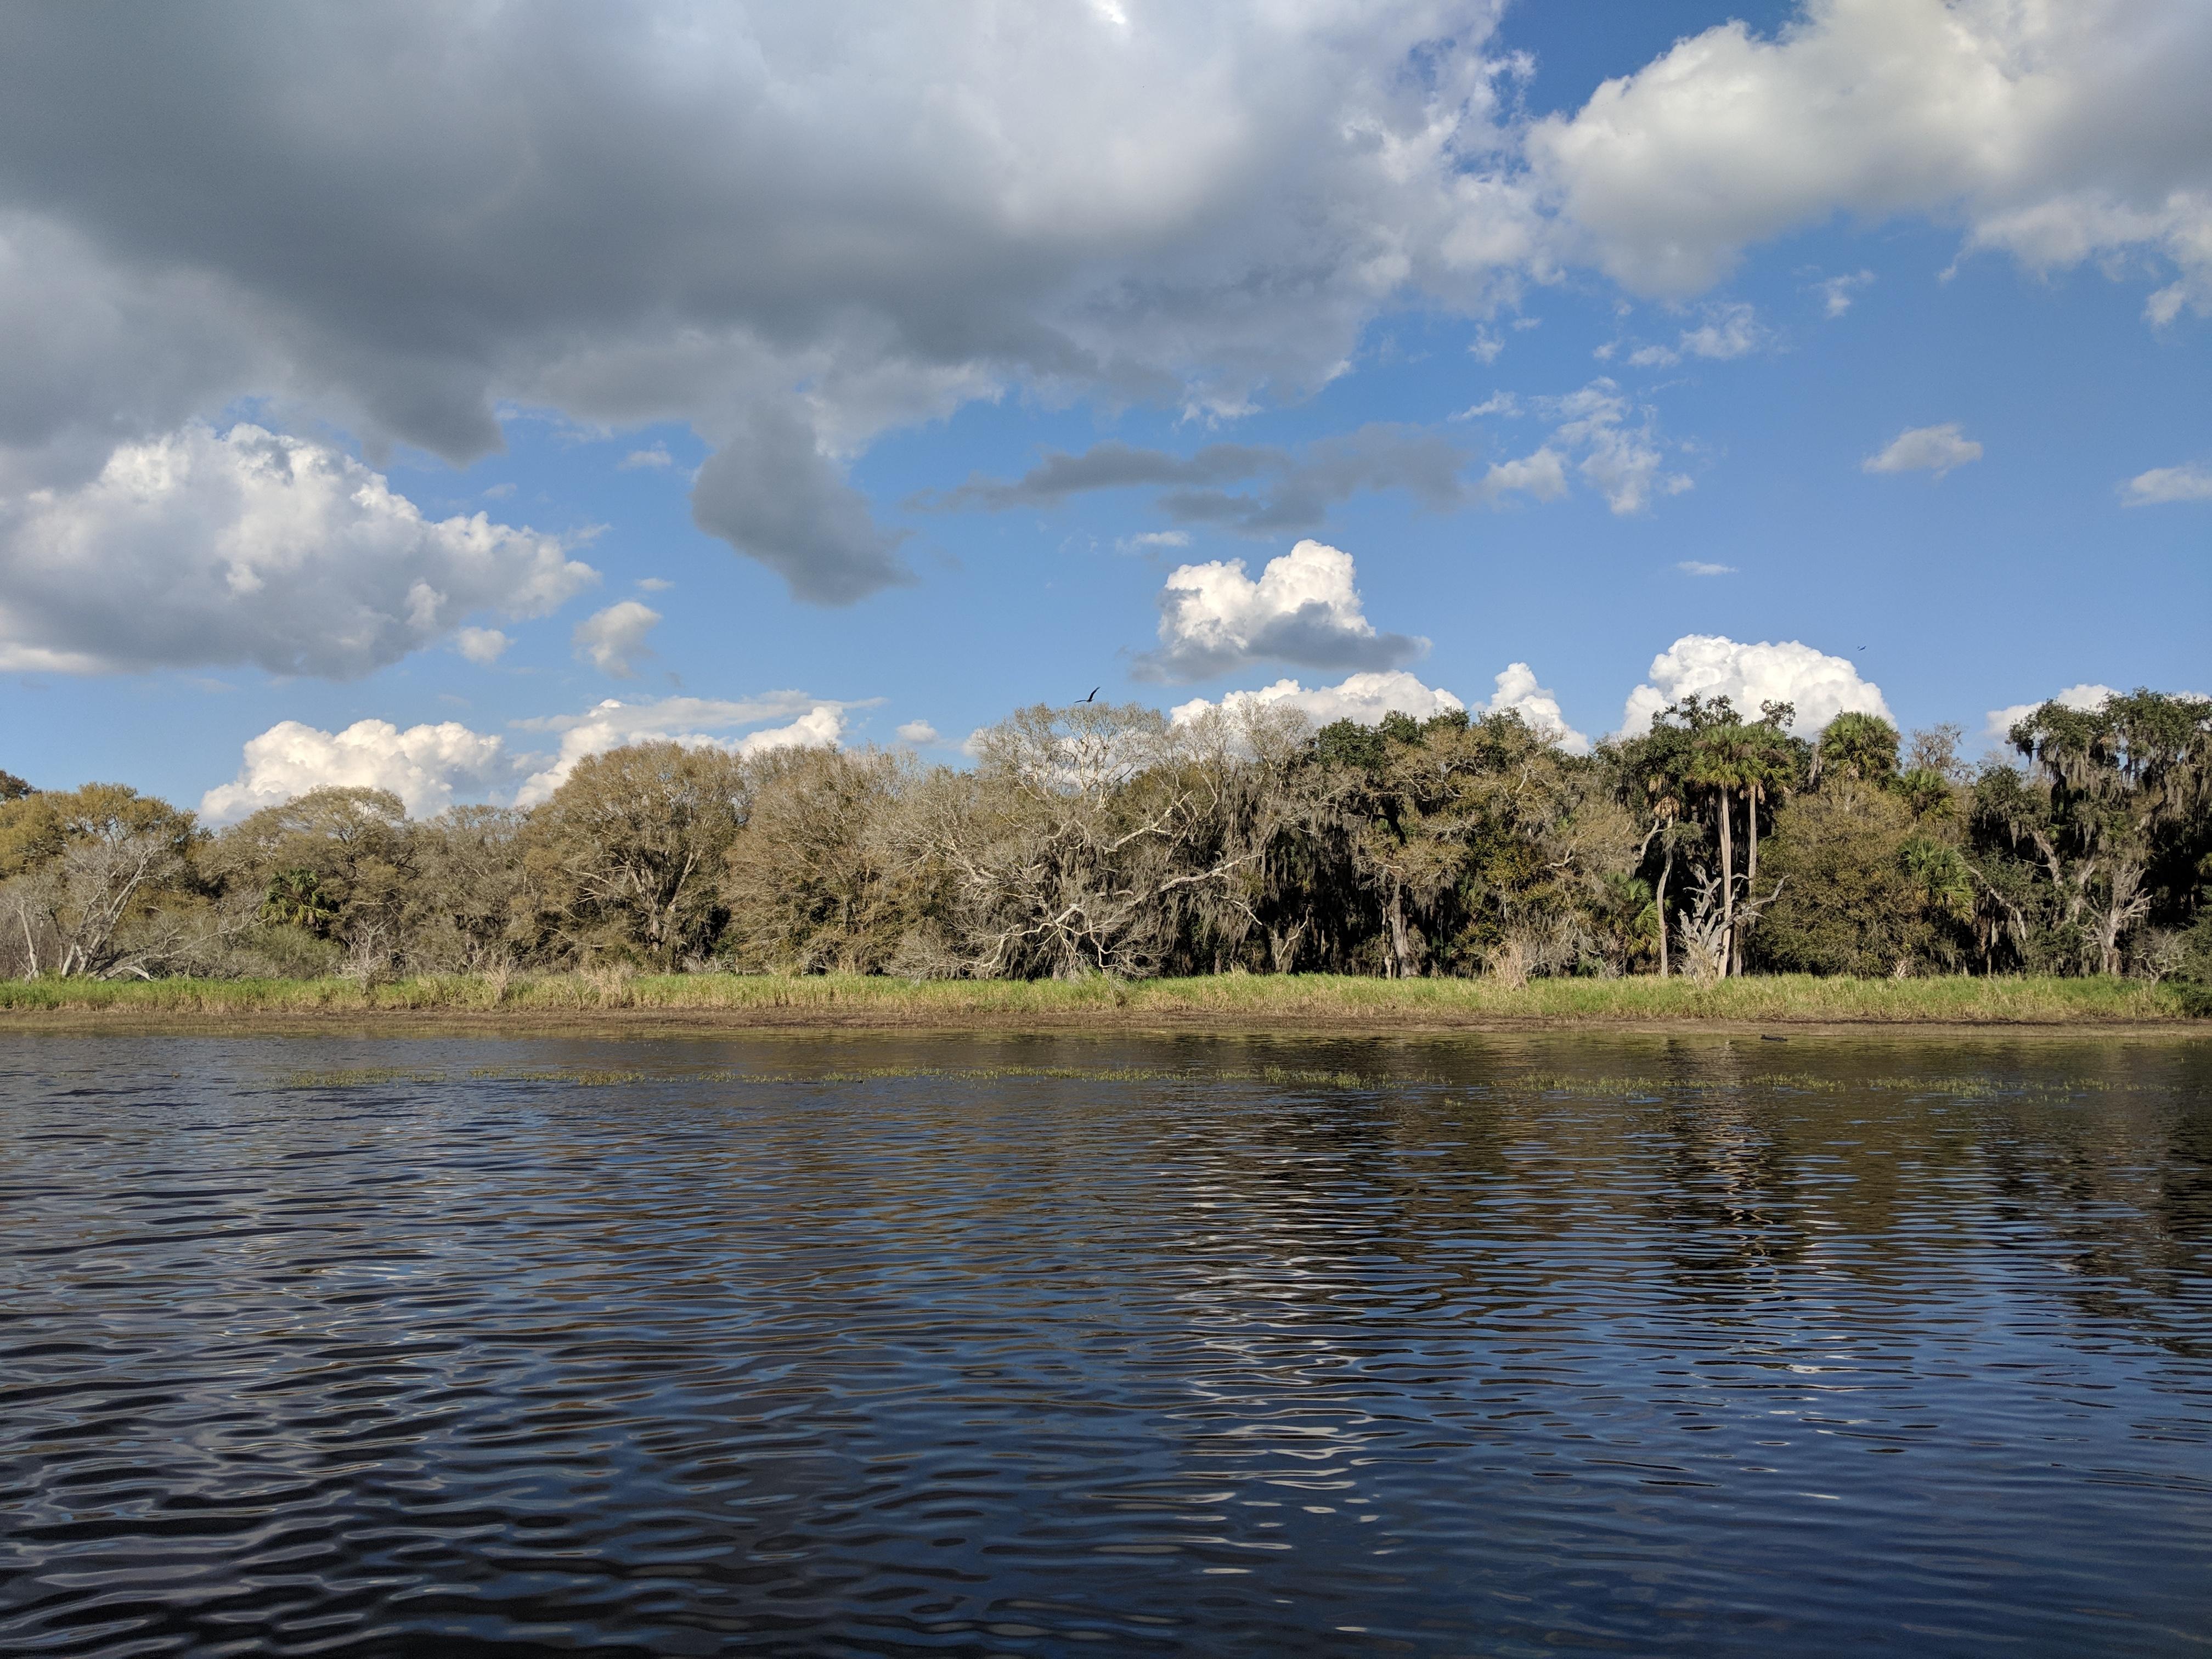 Myakka River State Park from Myakka River Boat Tours